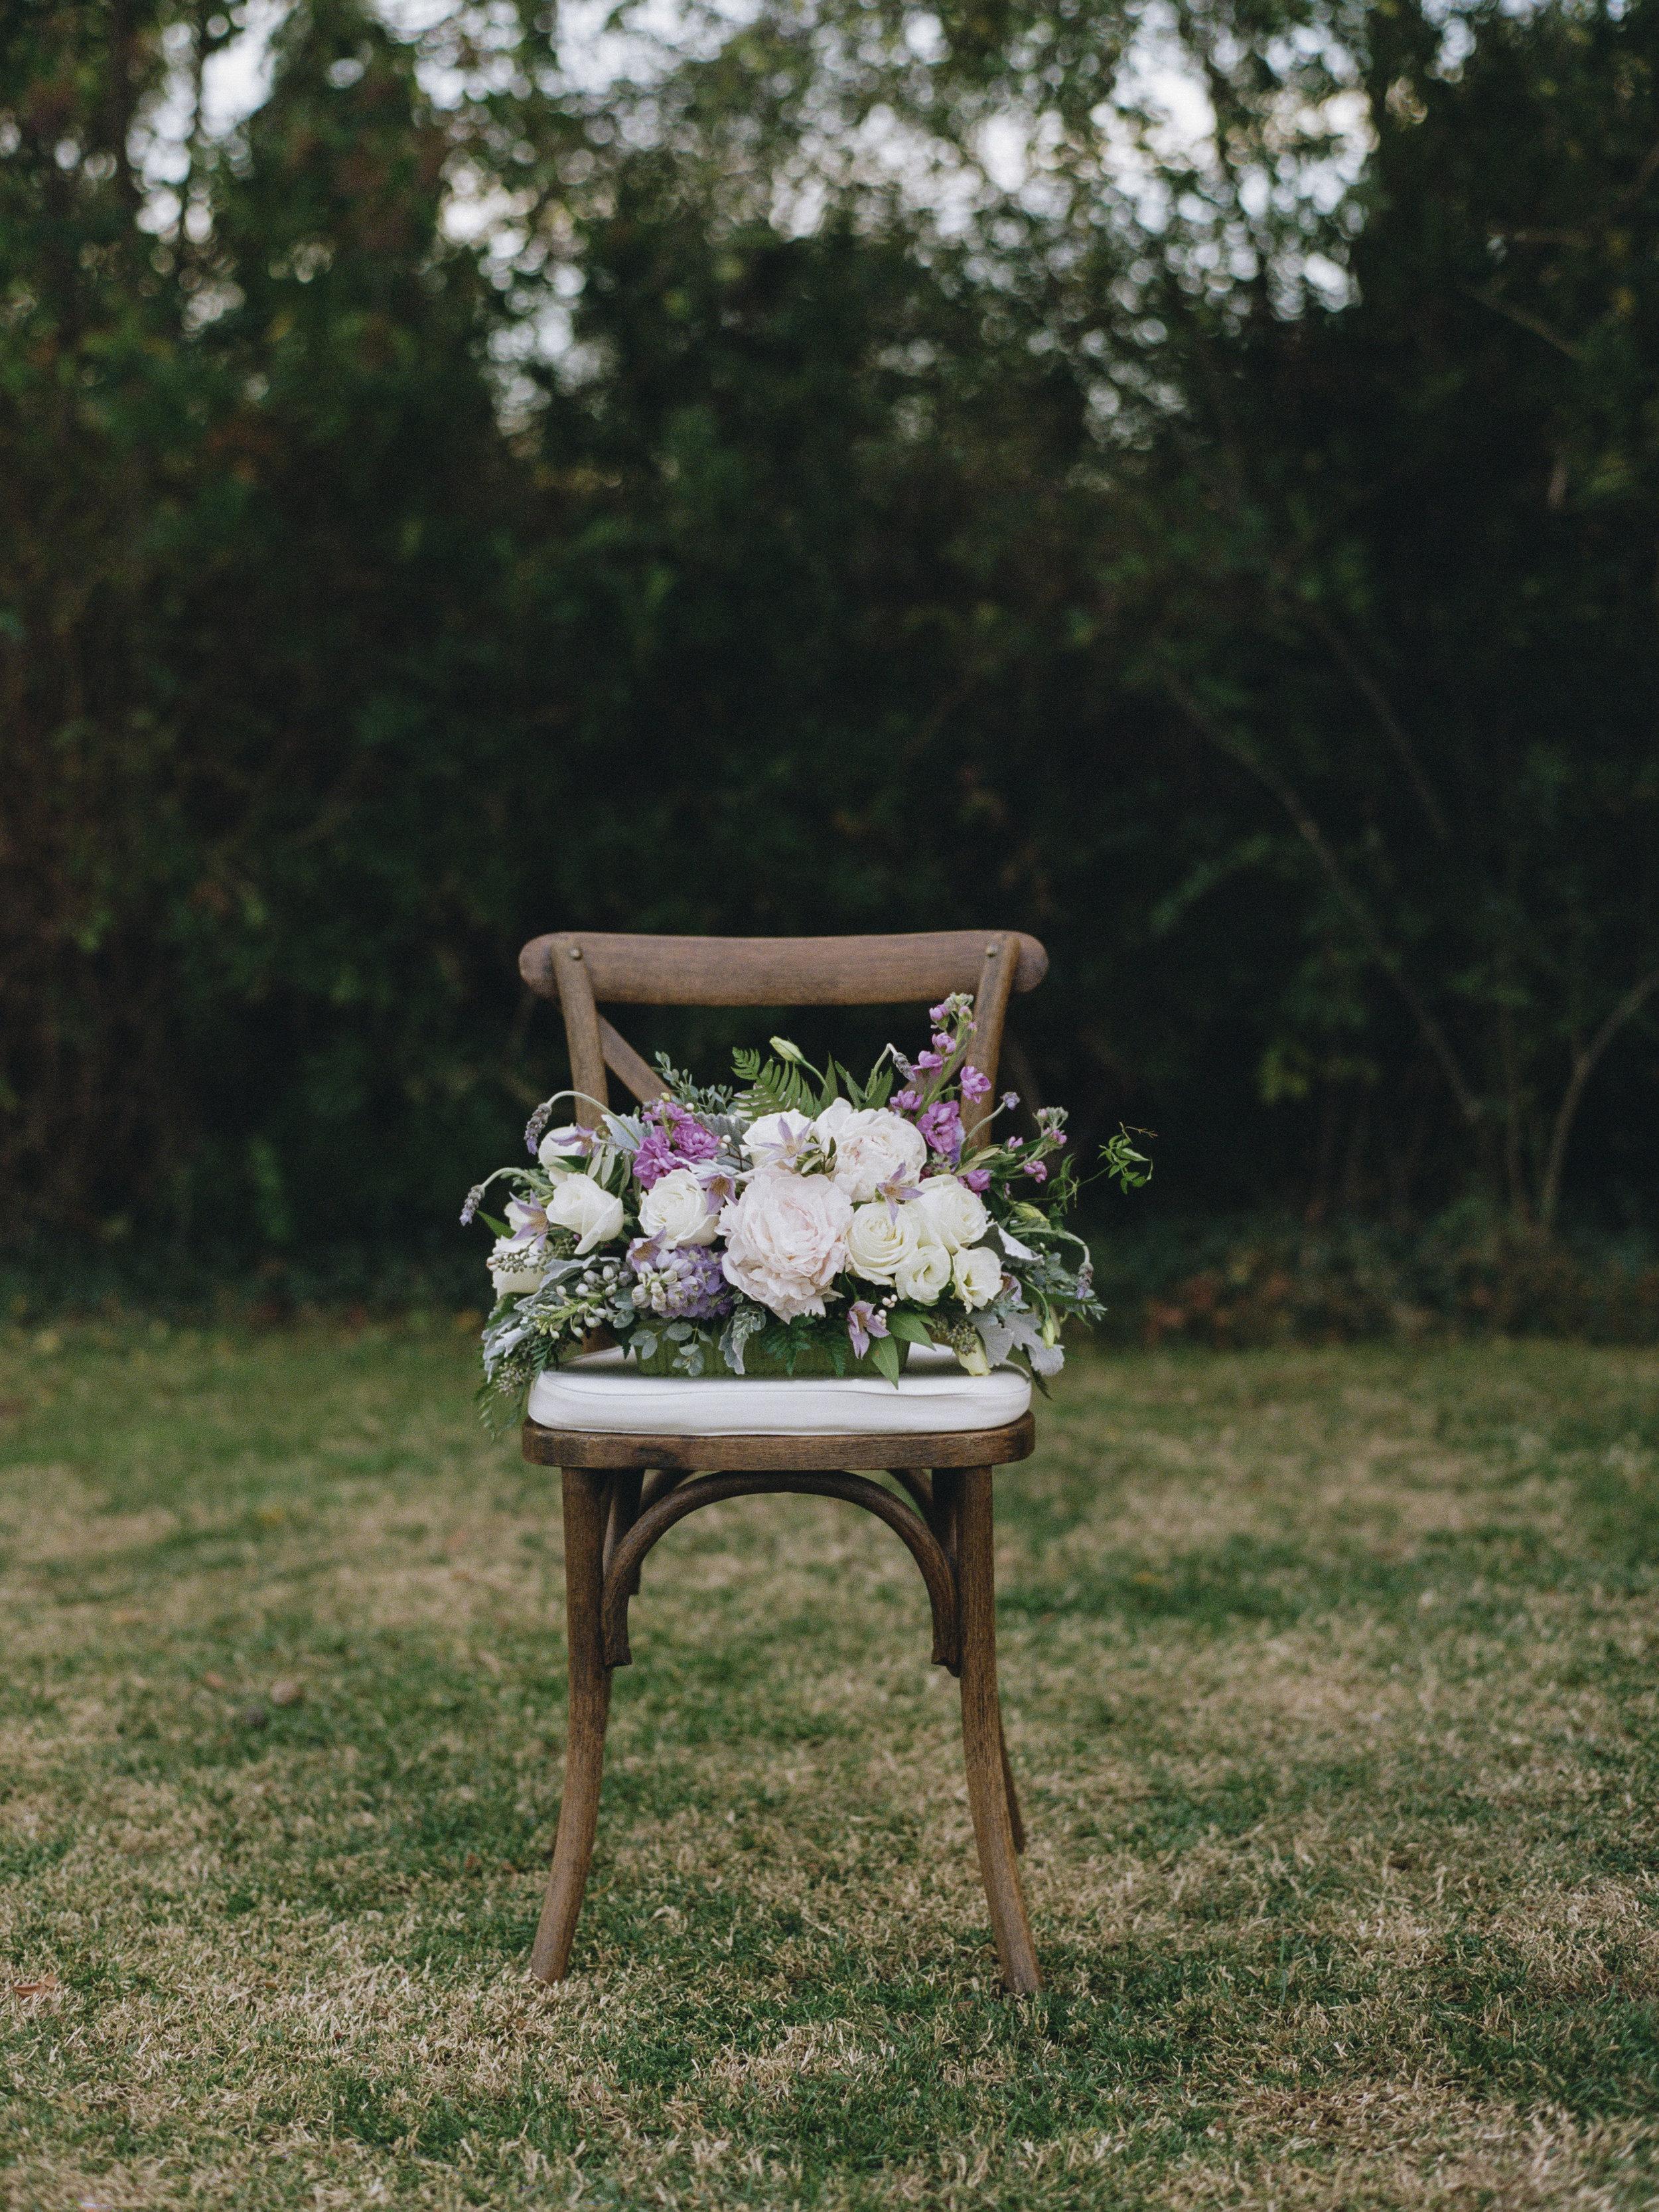 Violette-fleurs-roseville-sacramento-california-Flower-farm-inn-wedding-florist-spring-tablescape-blush-purples-sophisticated-design-chair-nature-upscale.jpg